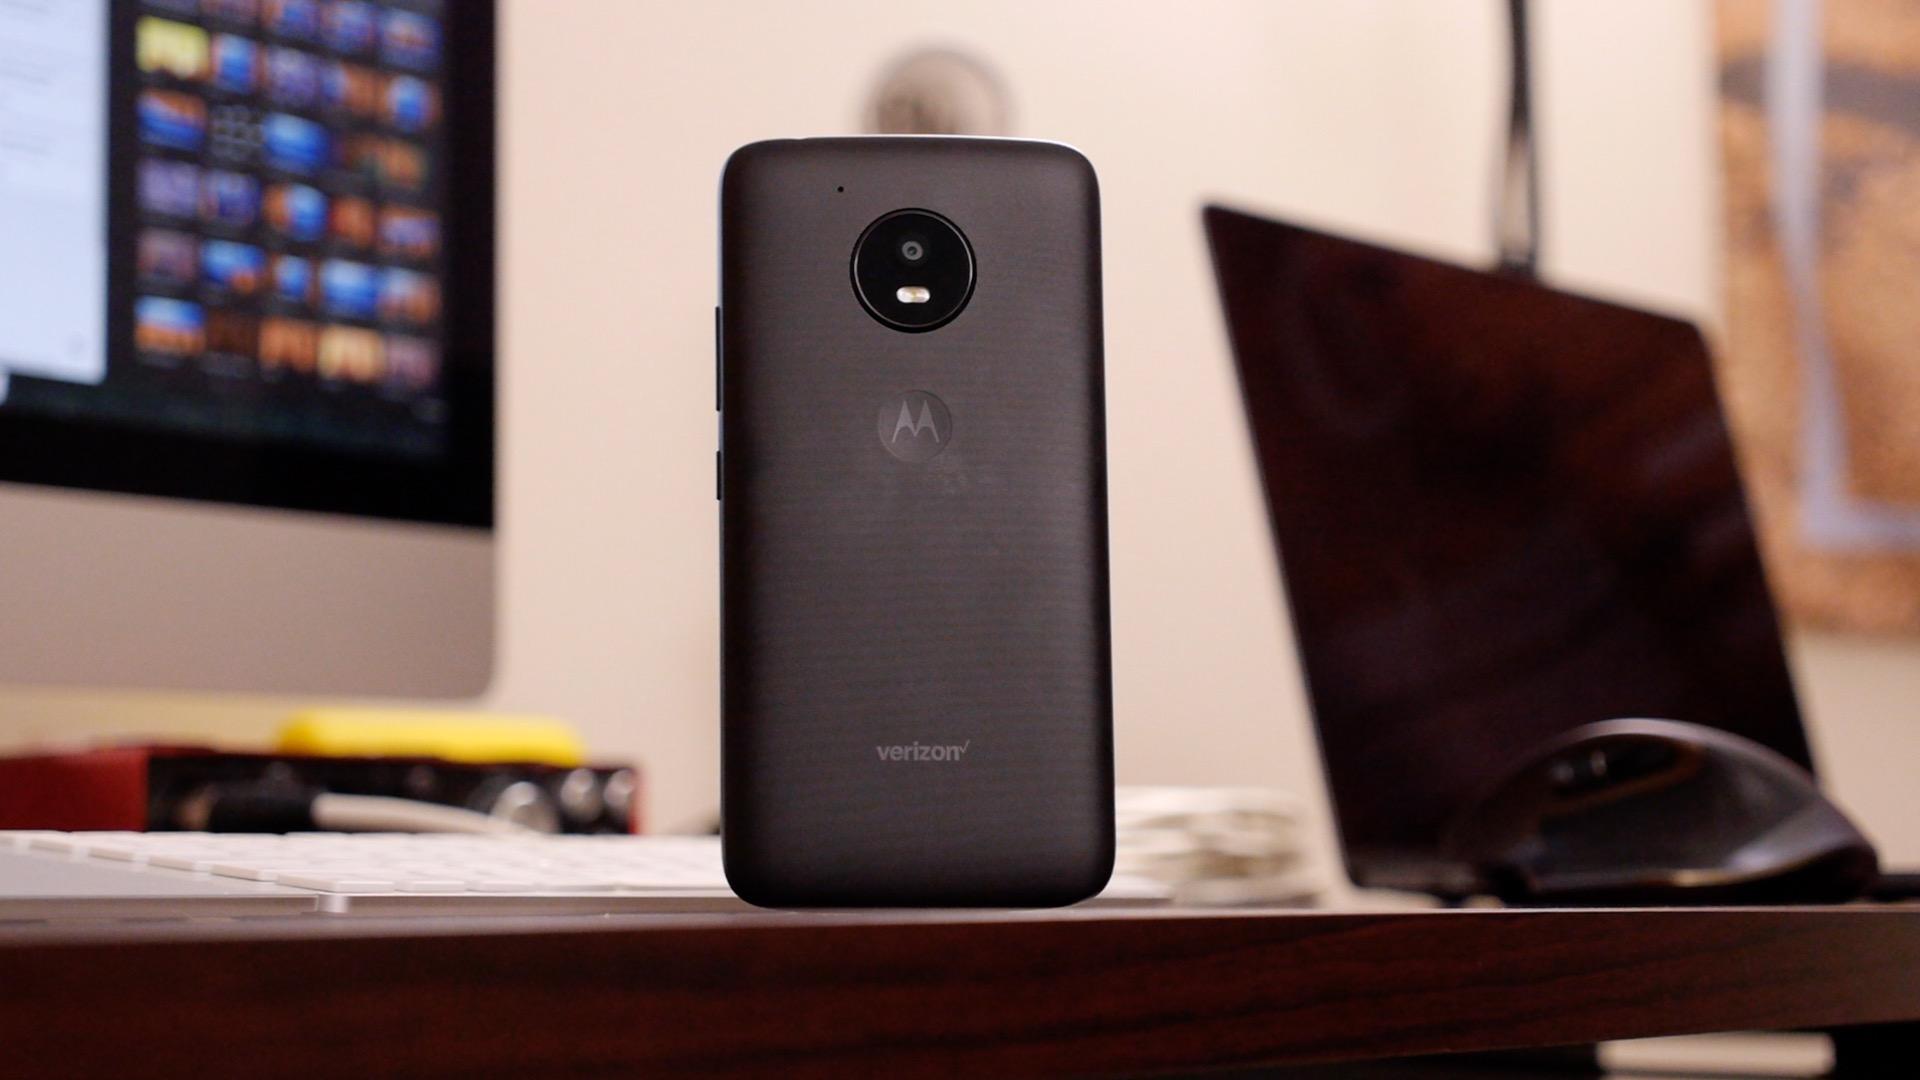 Moto E4 coming to MetroPCS for free with rebate - 9to5Google